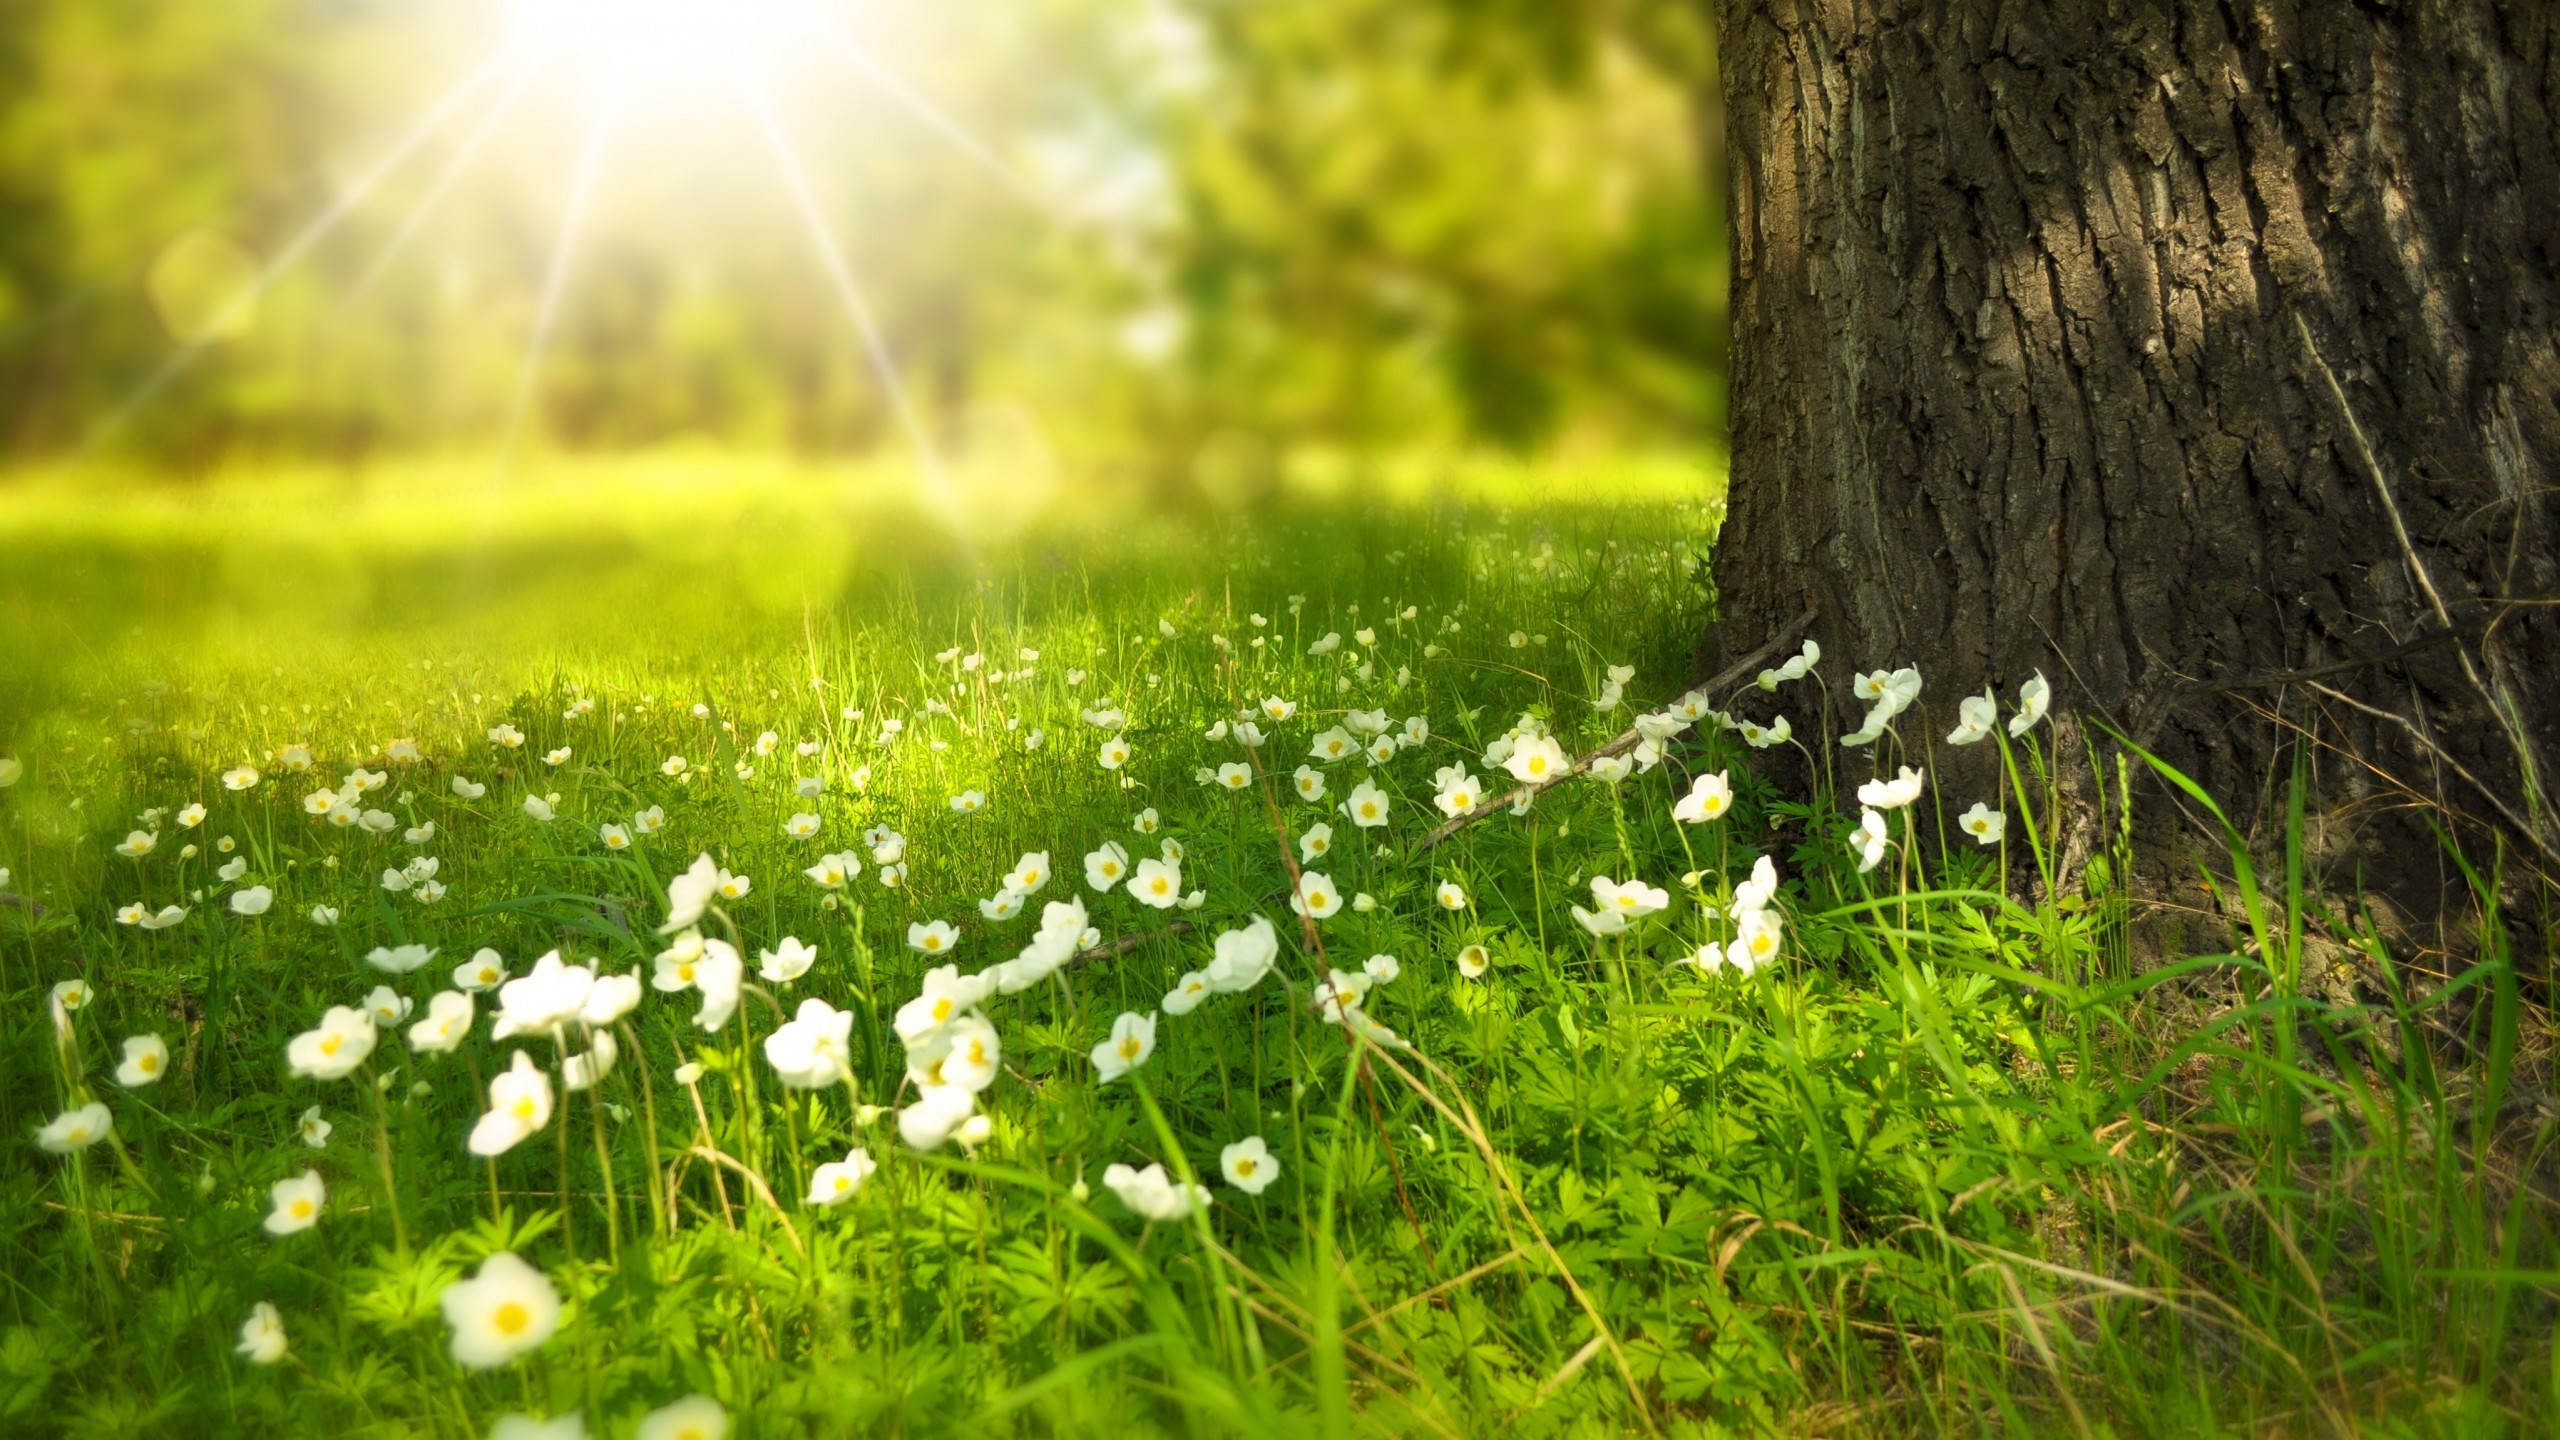 Screen Desktop Spring Wallpaper HD Download High Definiton 2560x1440